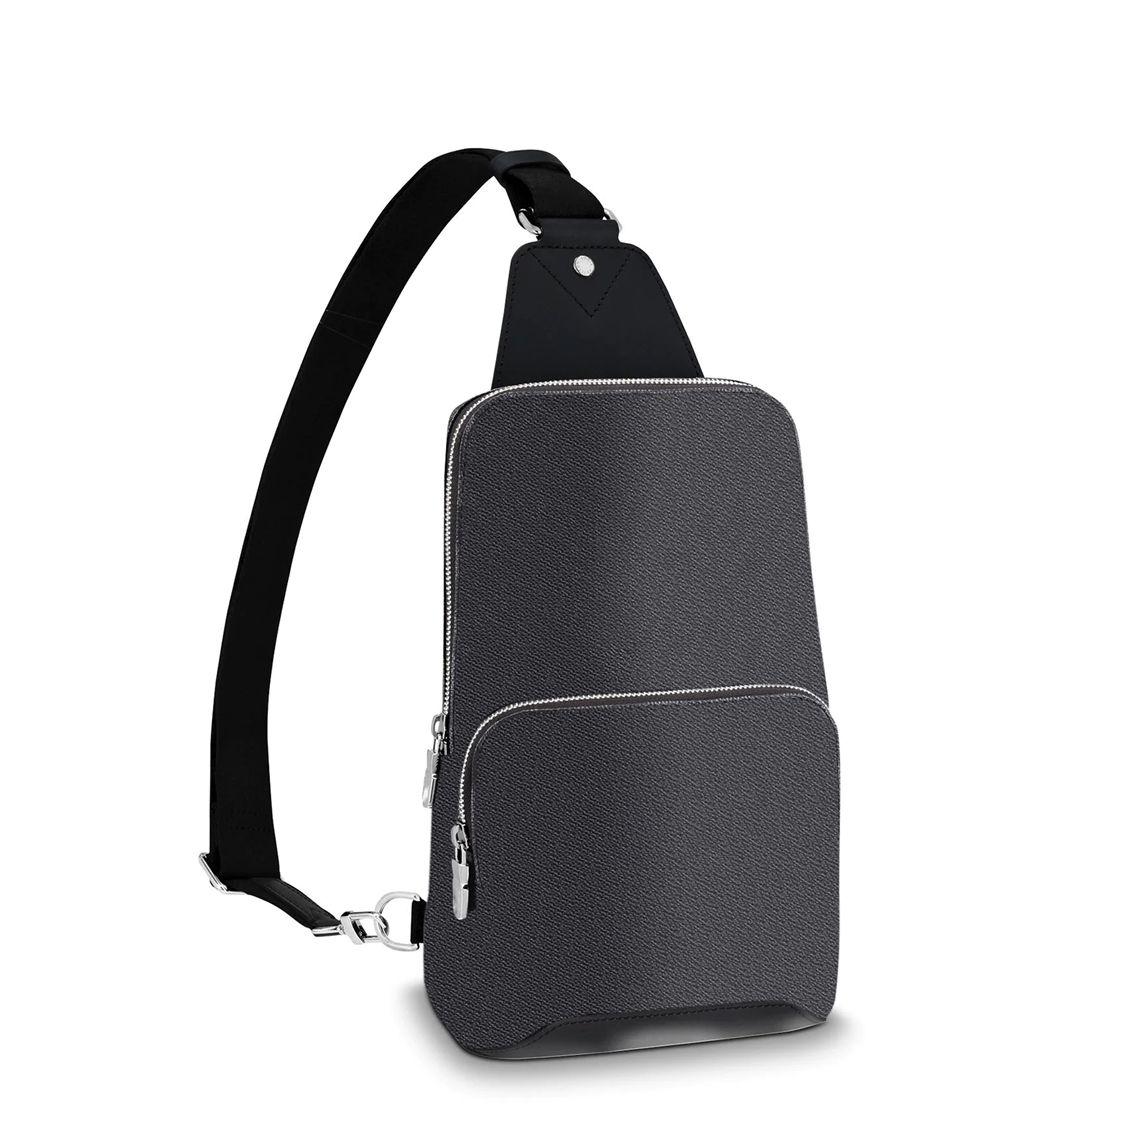 Cross Body Shoulder Bags Mens Handbags Backpack Men Tote Crossbody Bag Purses Womens Leather Clutch Handbag Fashion Wallet Fannypack 55 332